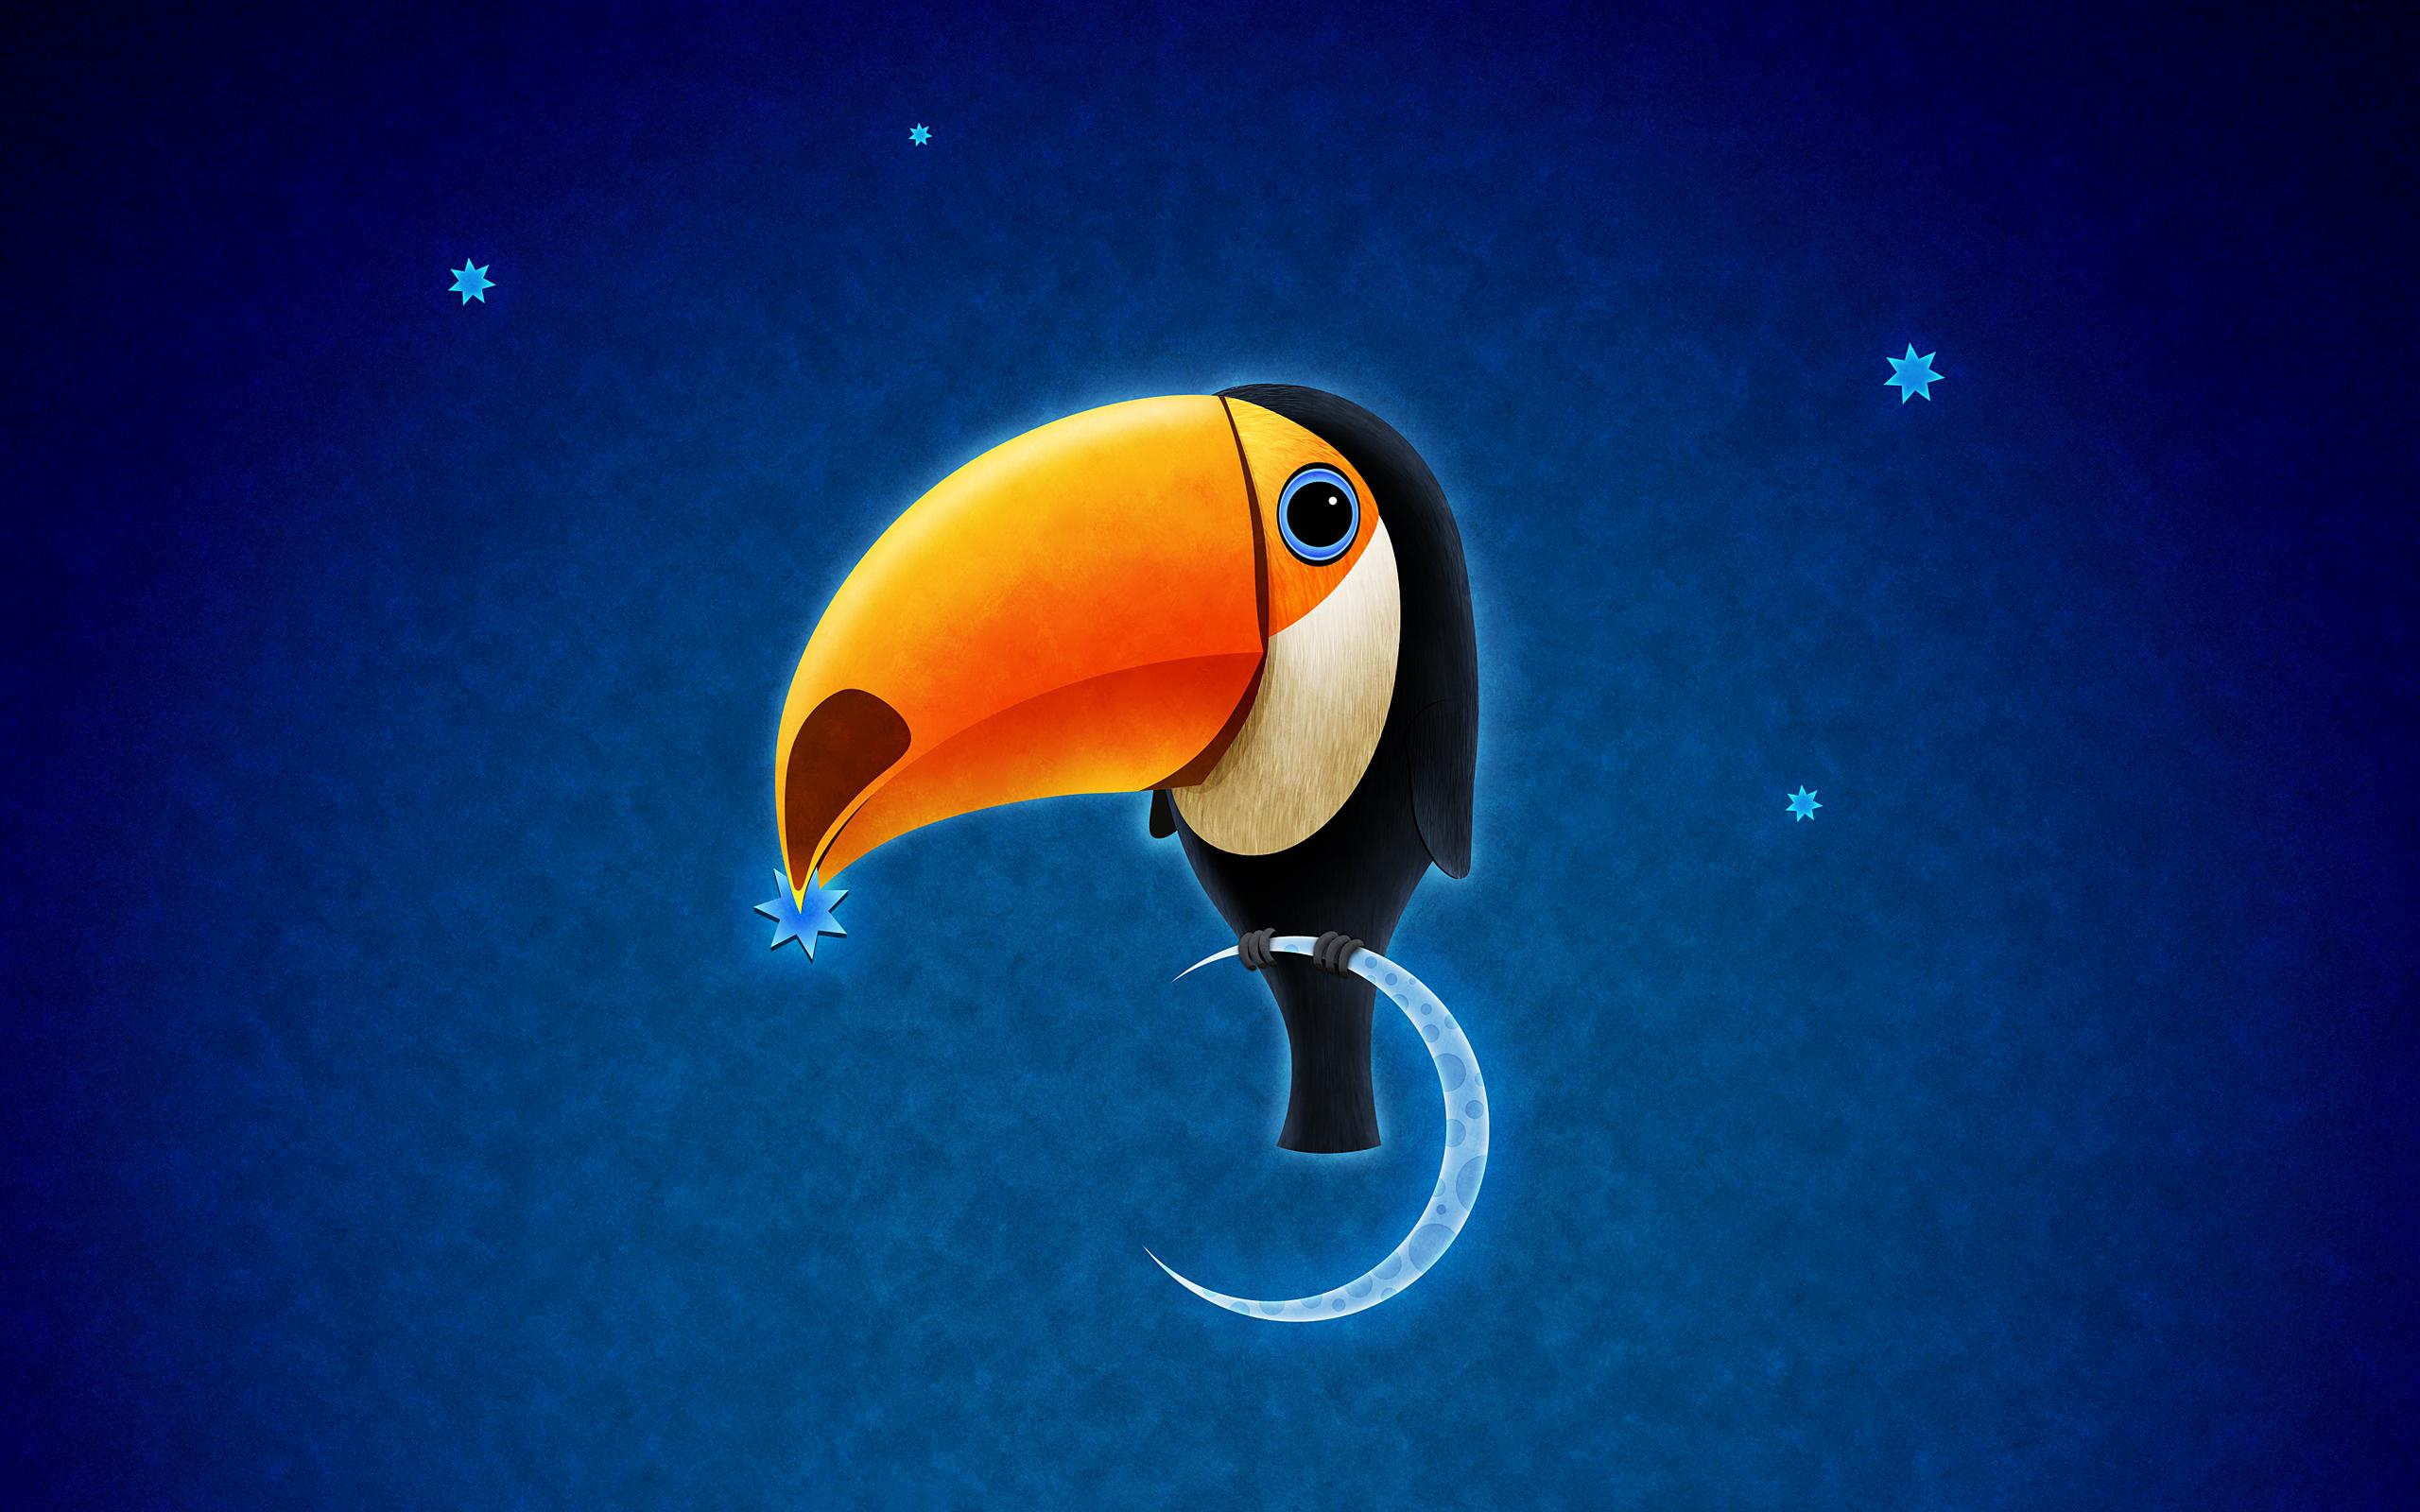 toucan bird cartoon 19905